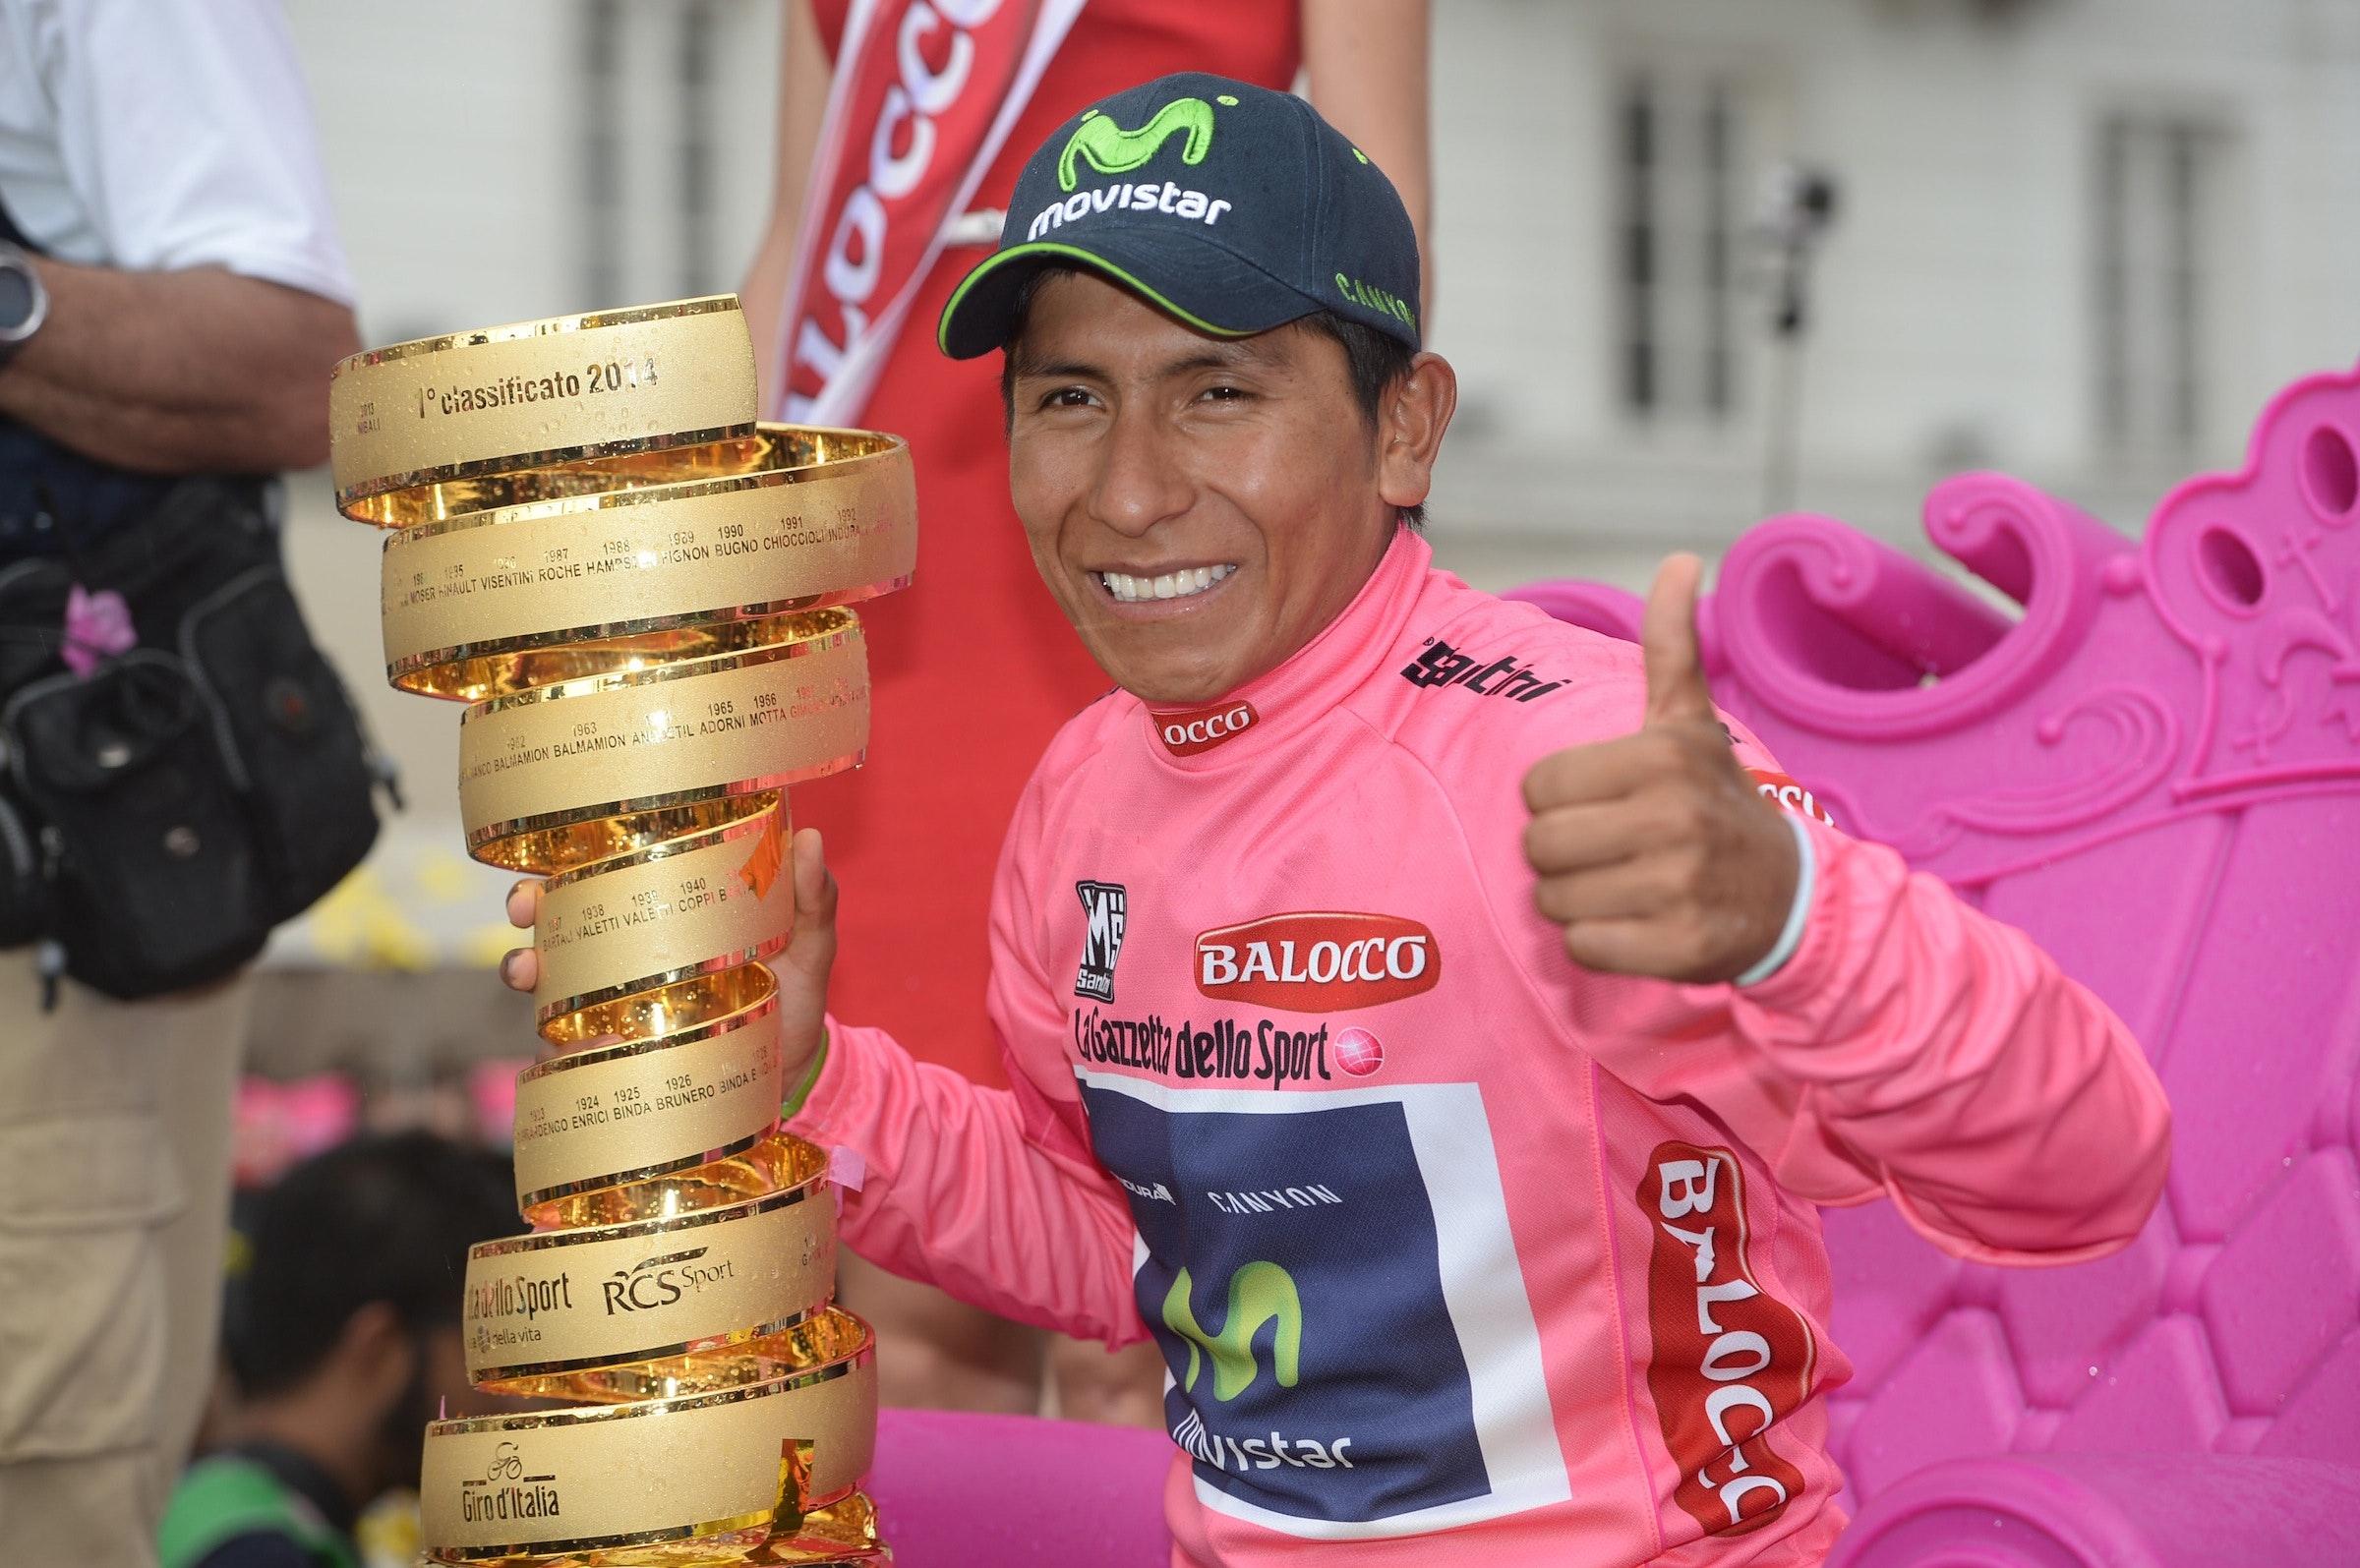 Nairo Quintana, Senza Fine, Giro d'Italia 2014, stage 21, pic: ©Sirotti